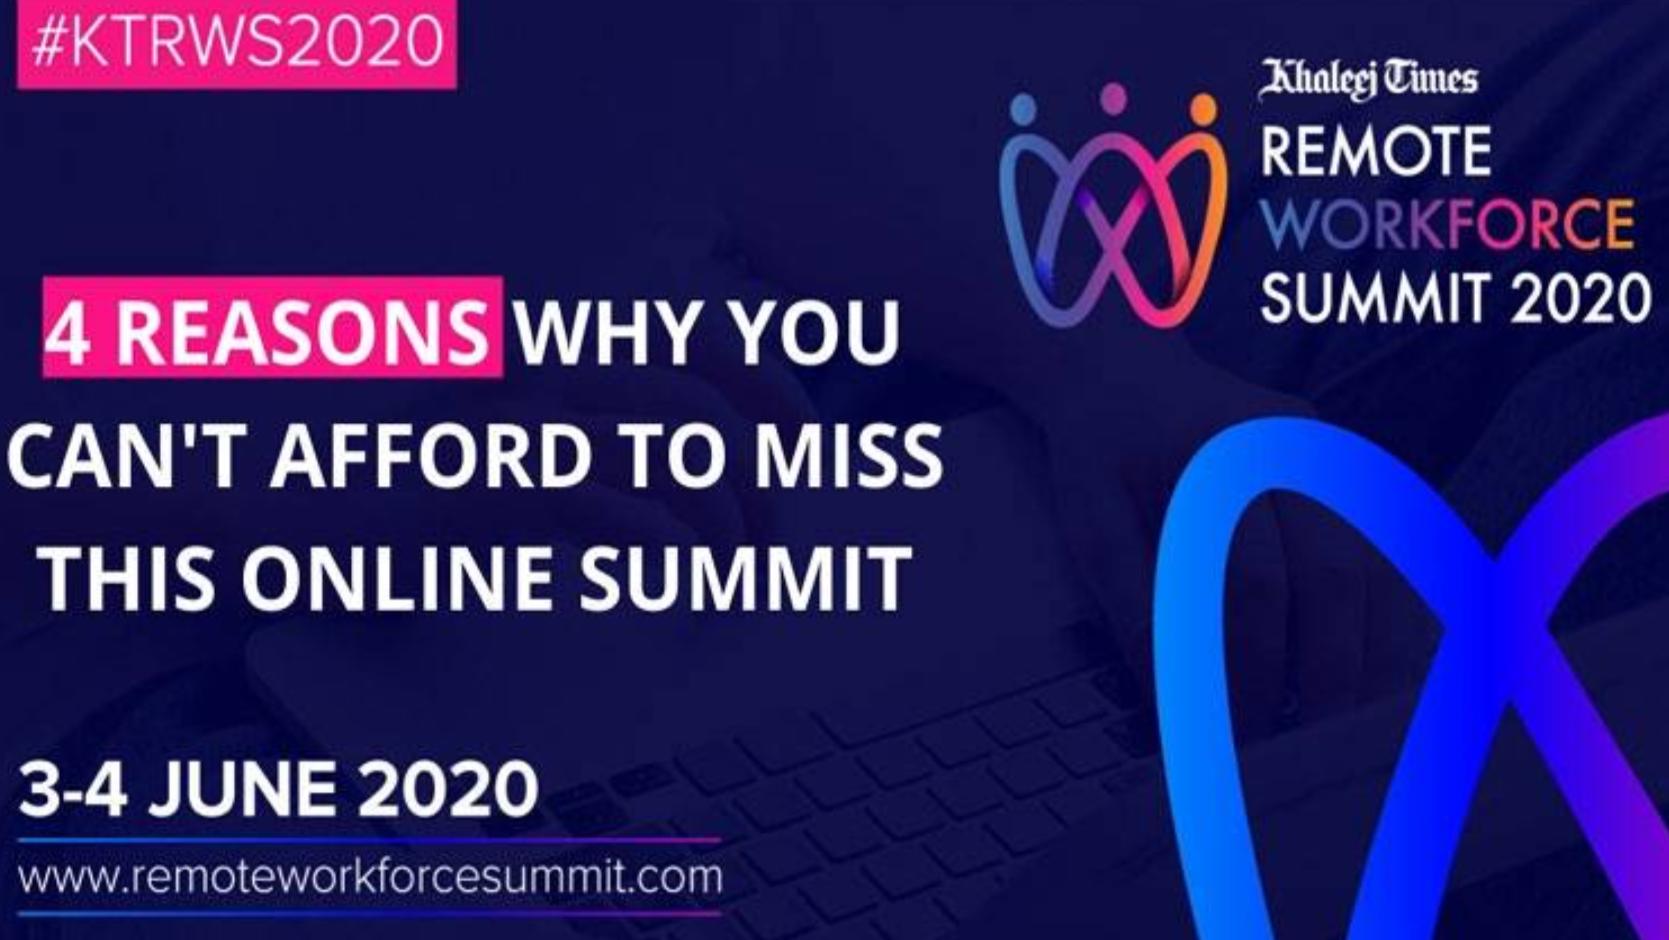 4 reasons why you shouldn't miss Khaleej Times Remote Workforce Summit 2020